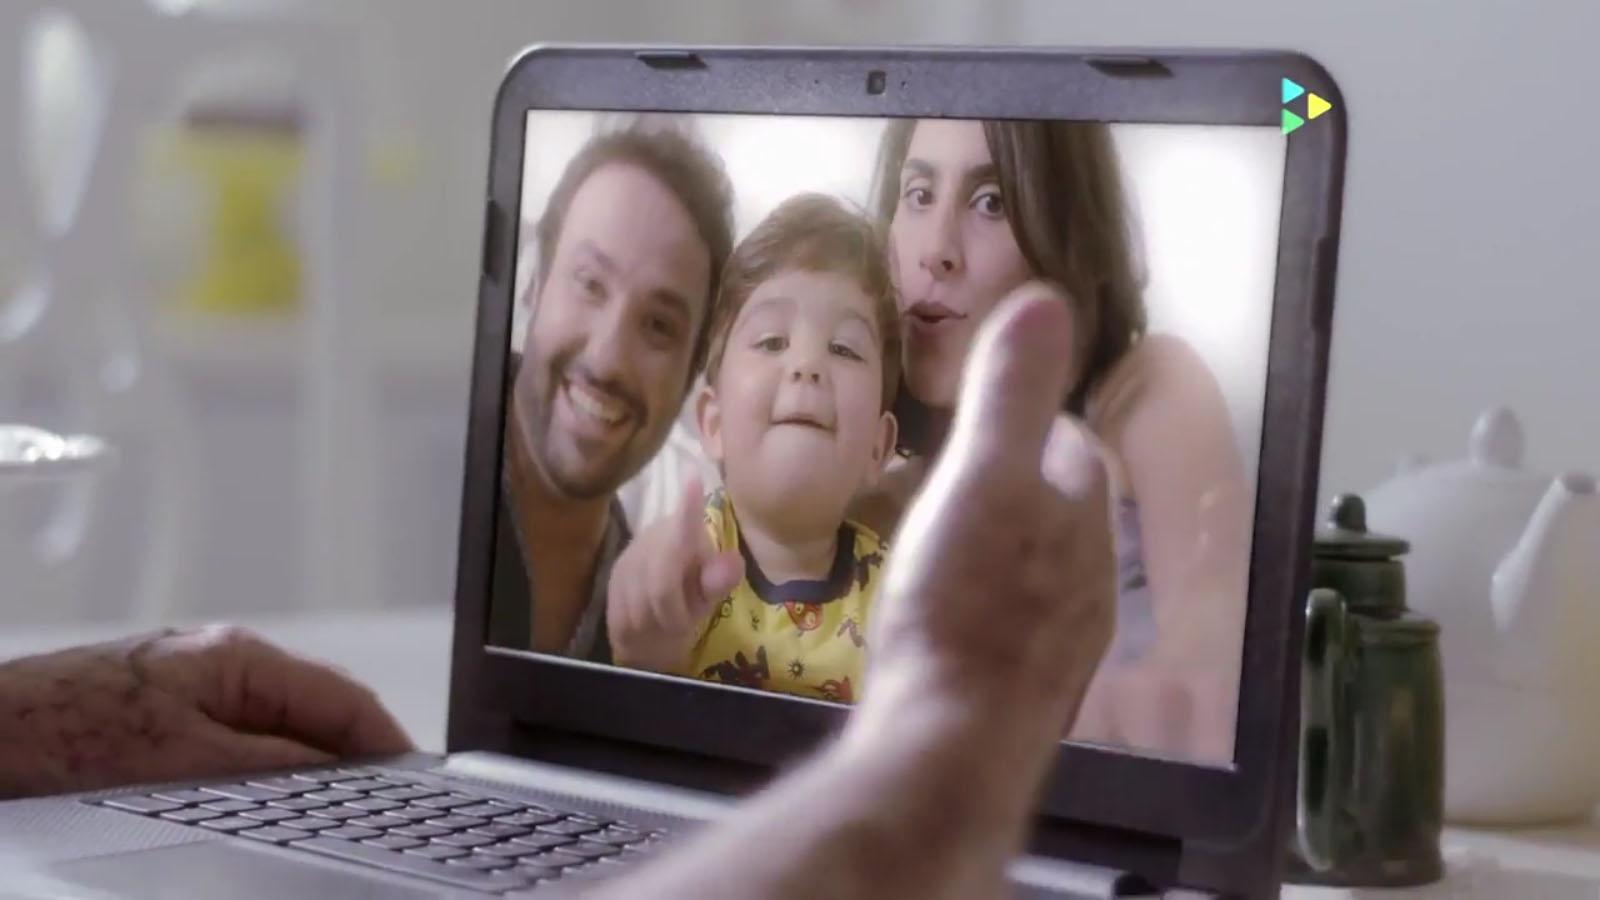 Viver Juntos - Algar Telecom